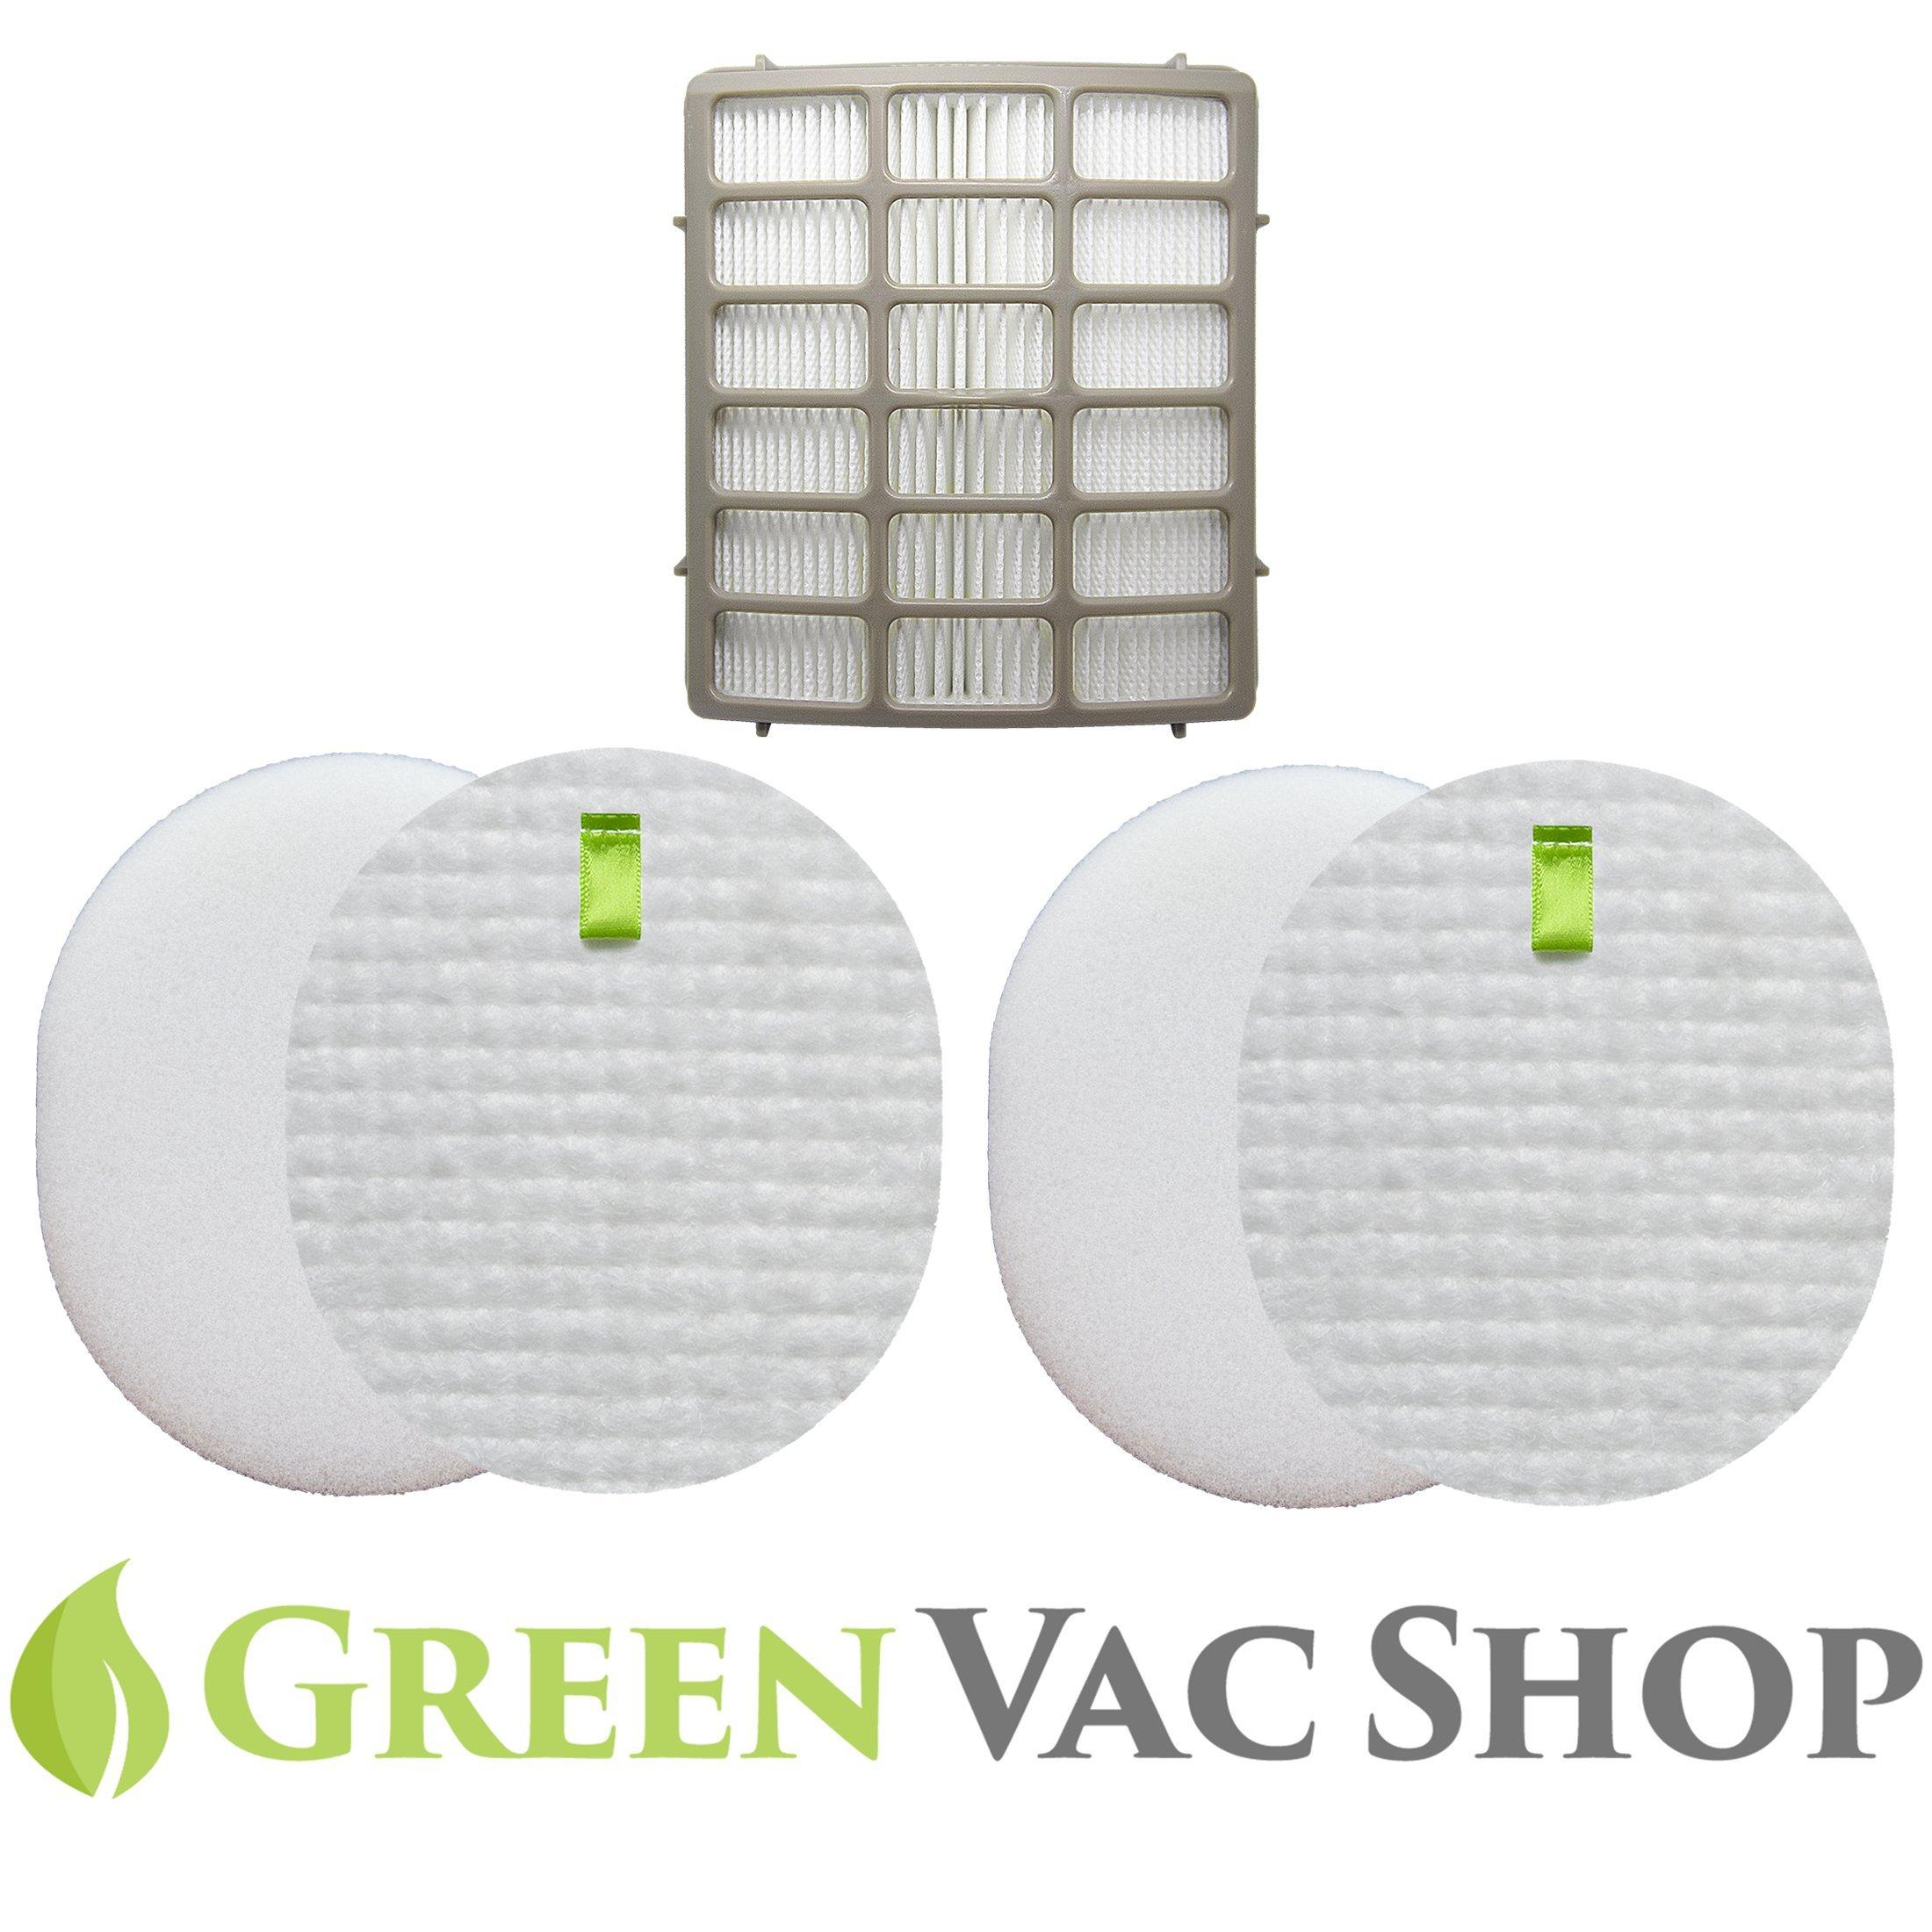 GreenVacShop 2+1 Pk Shark Navigator Professional (NV70, NV71, NV80, NVC80C, UV420)& Shark Rotator Professional XL Capacity (NV90, NV95) Replacement Filter Set, 2 Foam+2 Felt+1 HEPA Filters XFF80 XHF80